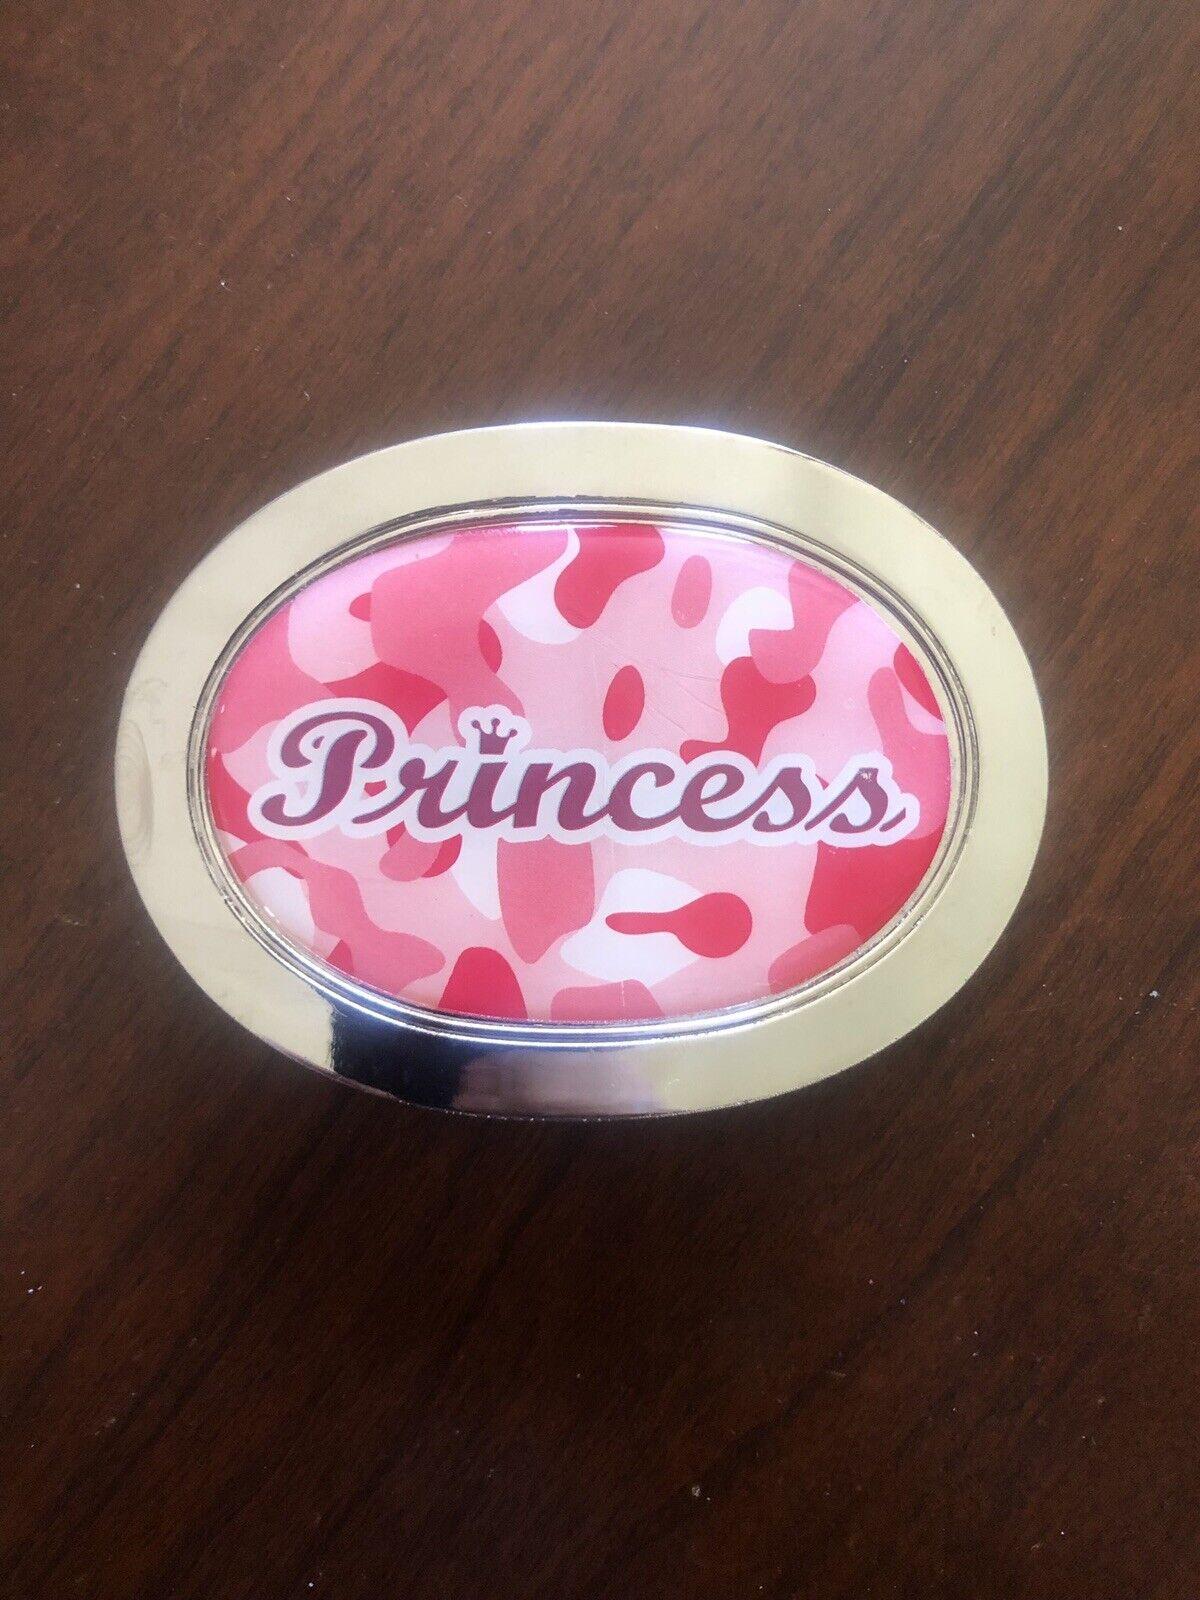 Princess Queen Royalty Pink Camouflage Camo Funny Metal Women's Belt Buckle